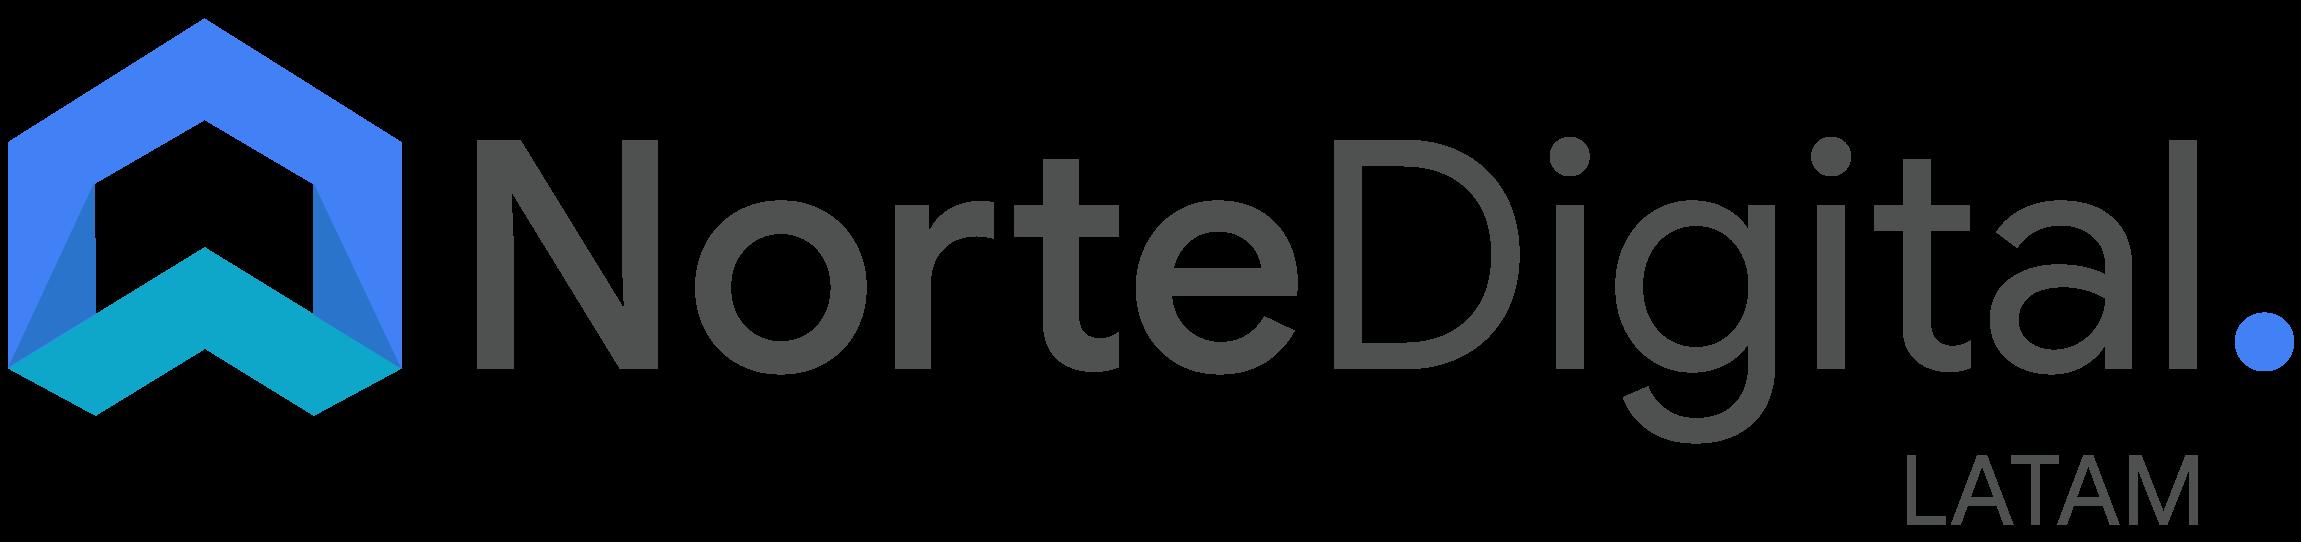 Norte Digital